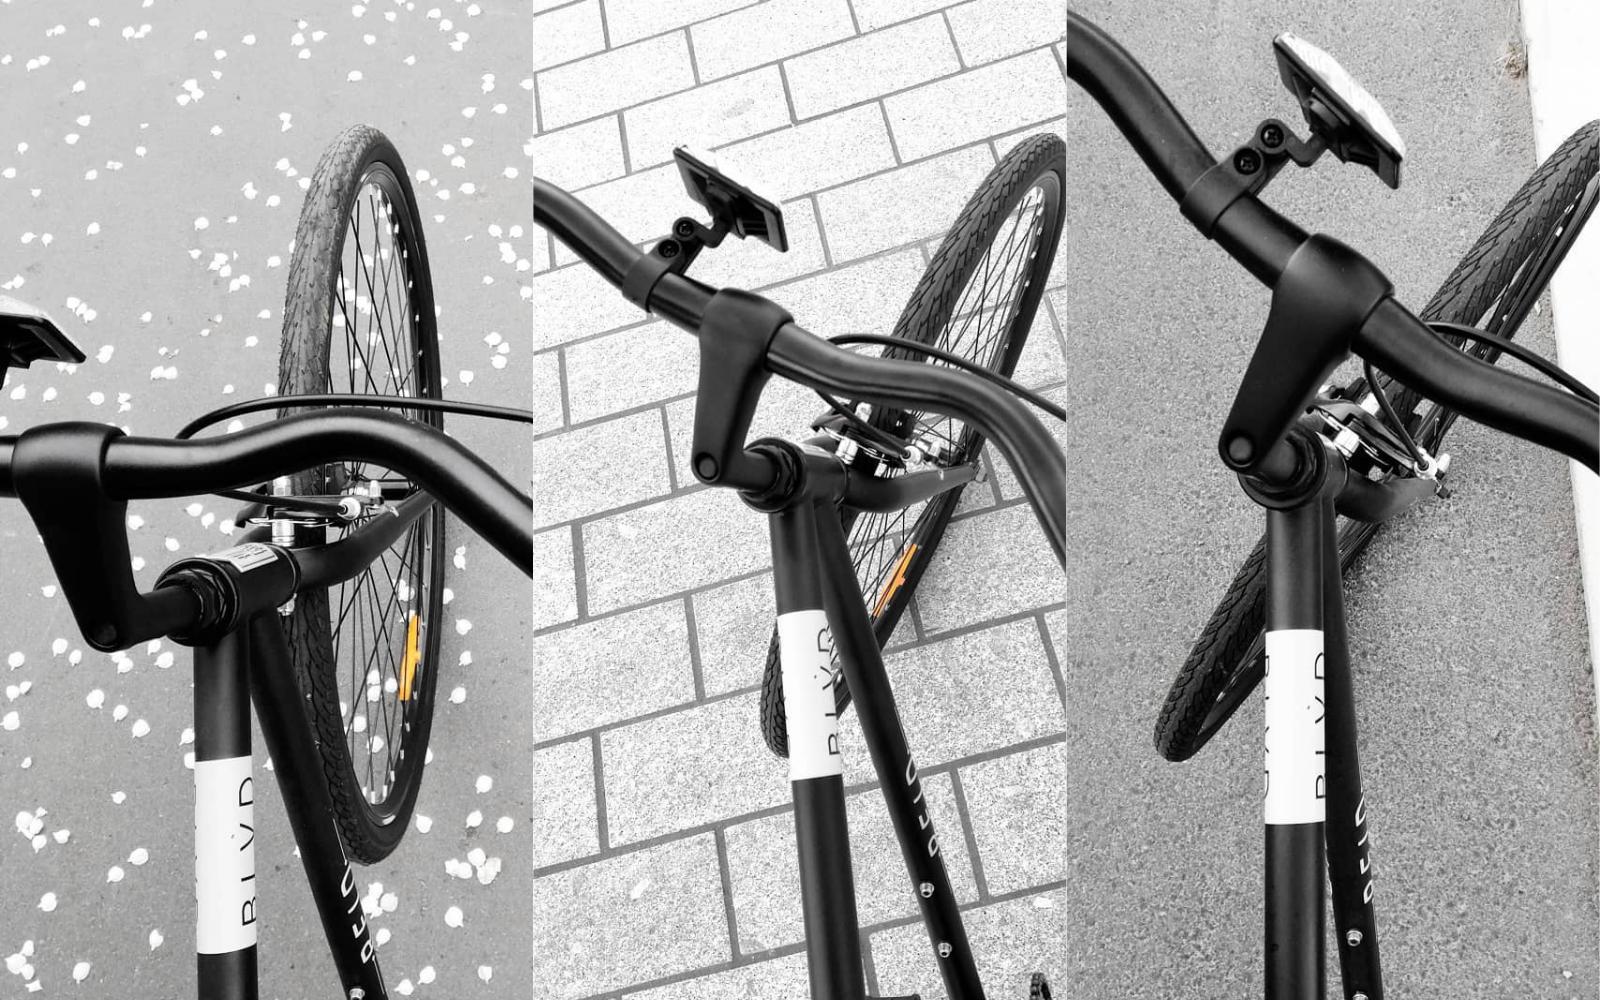 2 29 - Reid ® - BLVD Bike